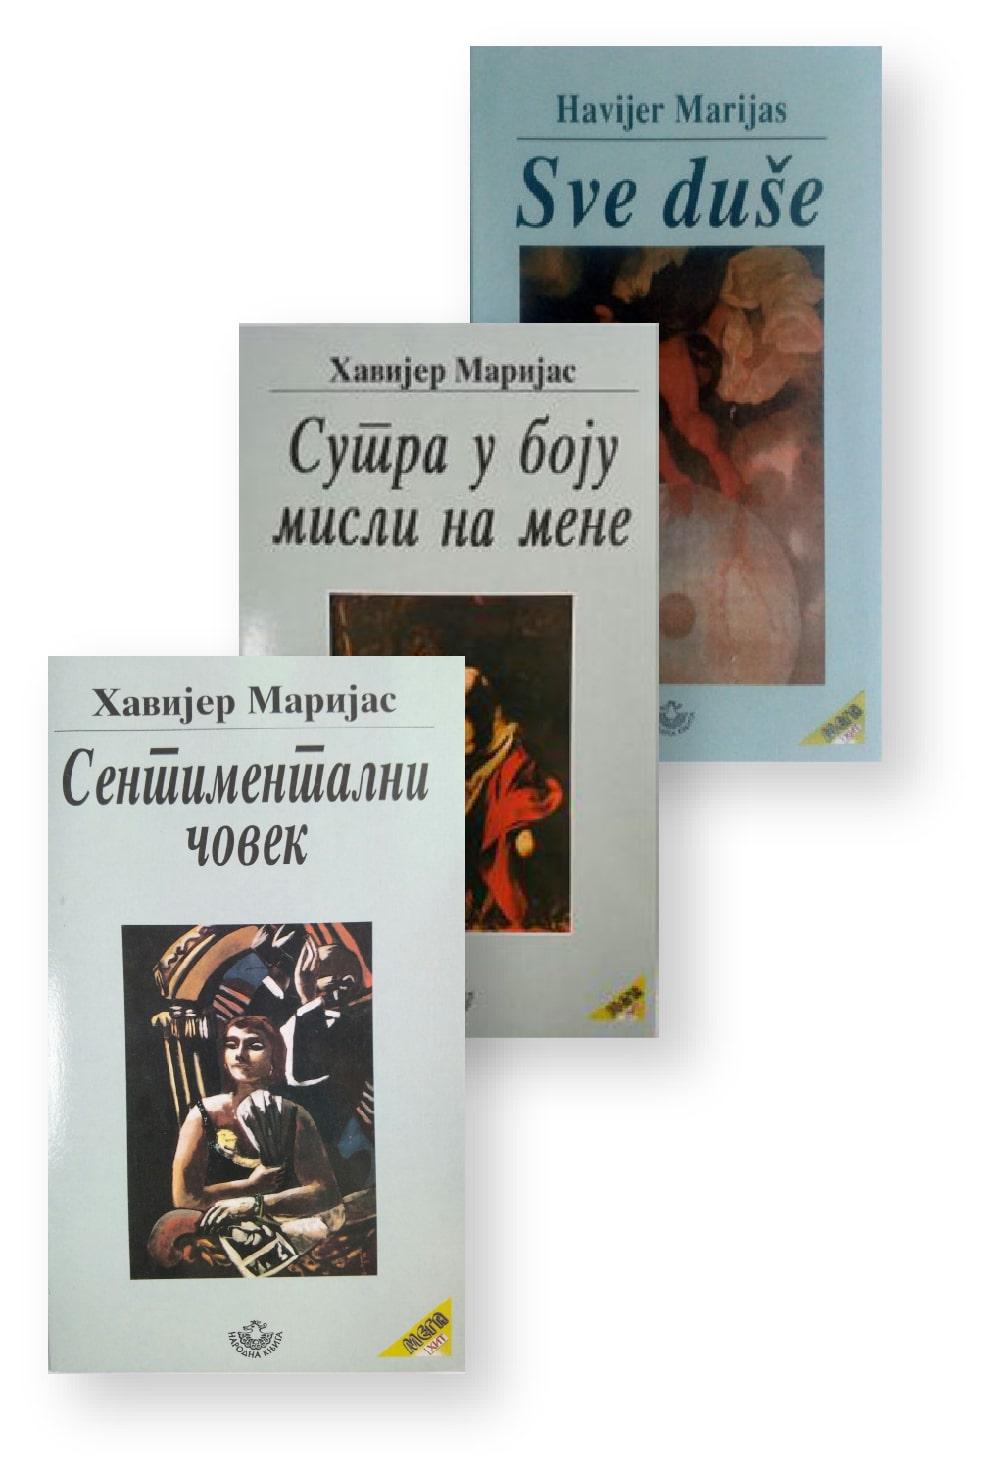 Komplet knjiga – Havijer Marijas